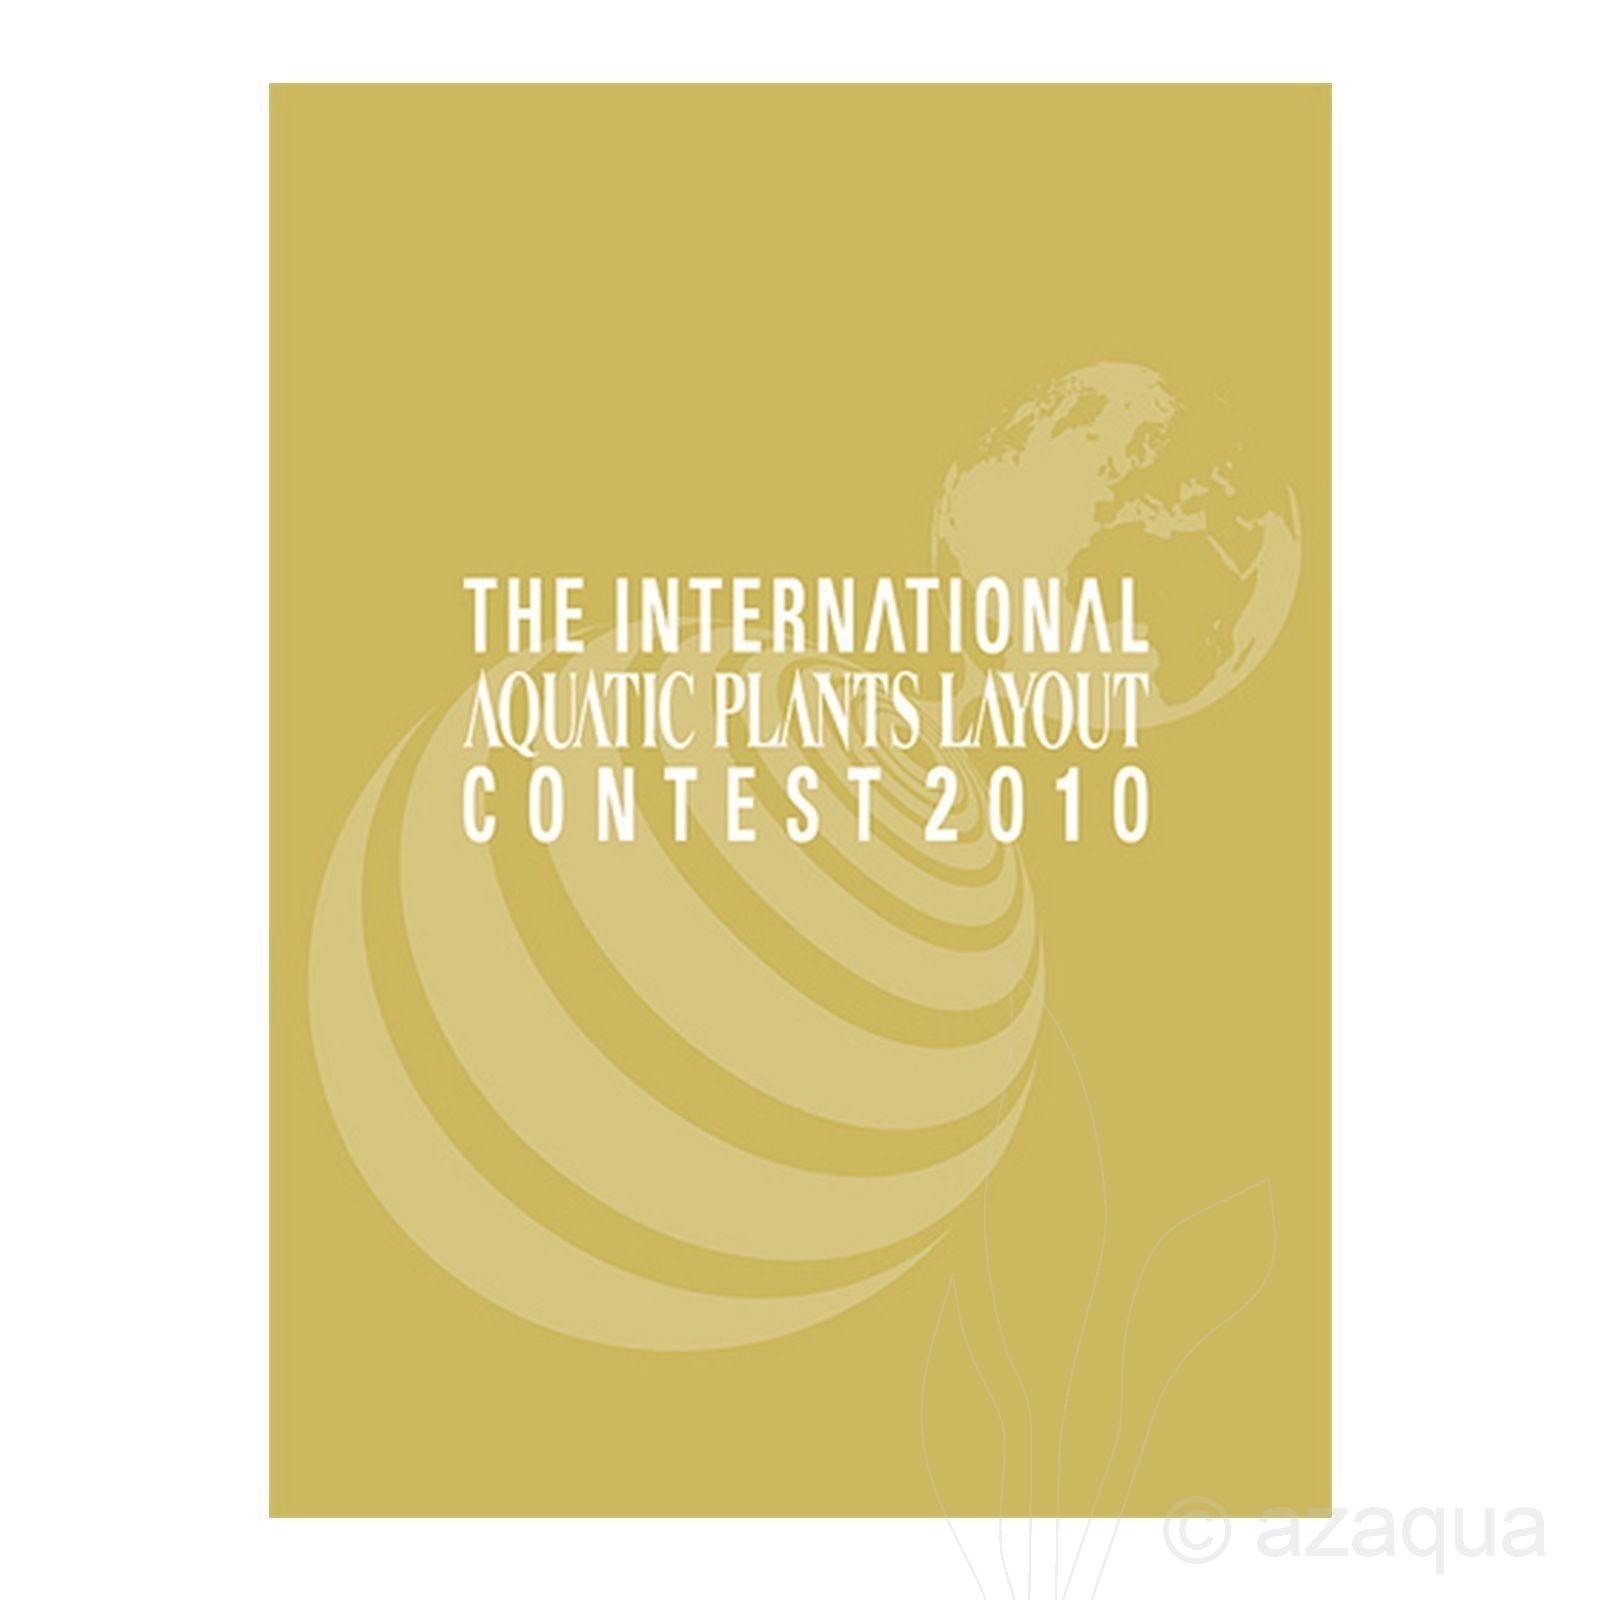 International Aquatic Plants Layout Contest Book 2010